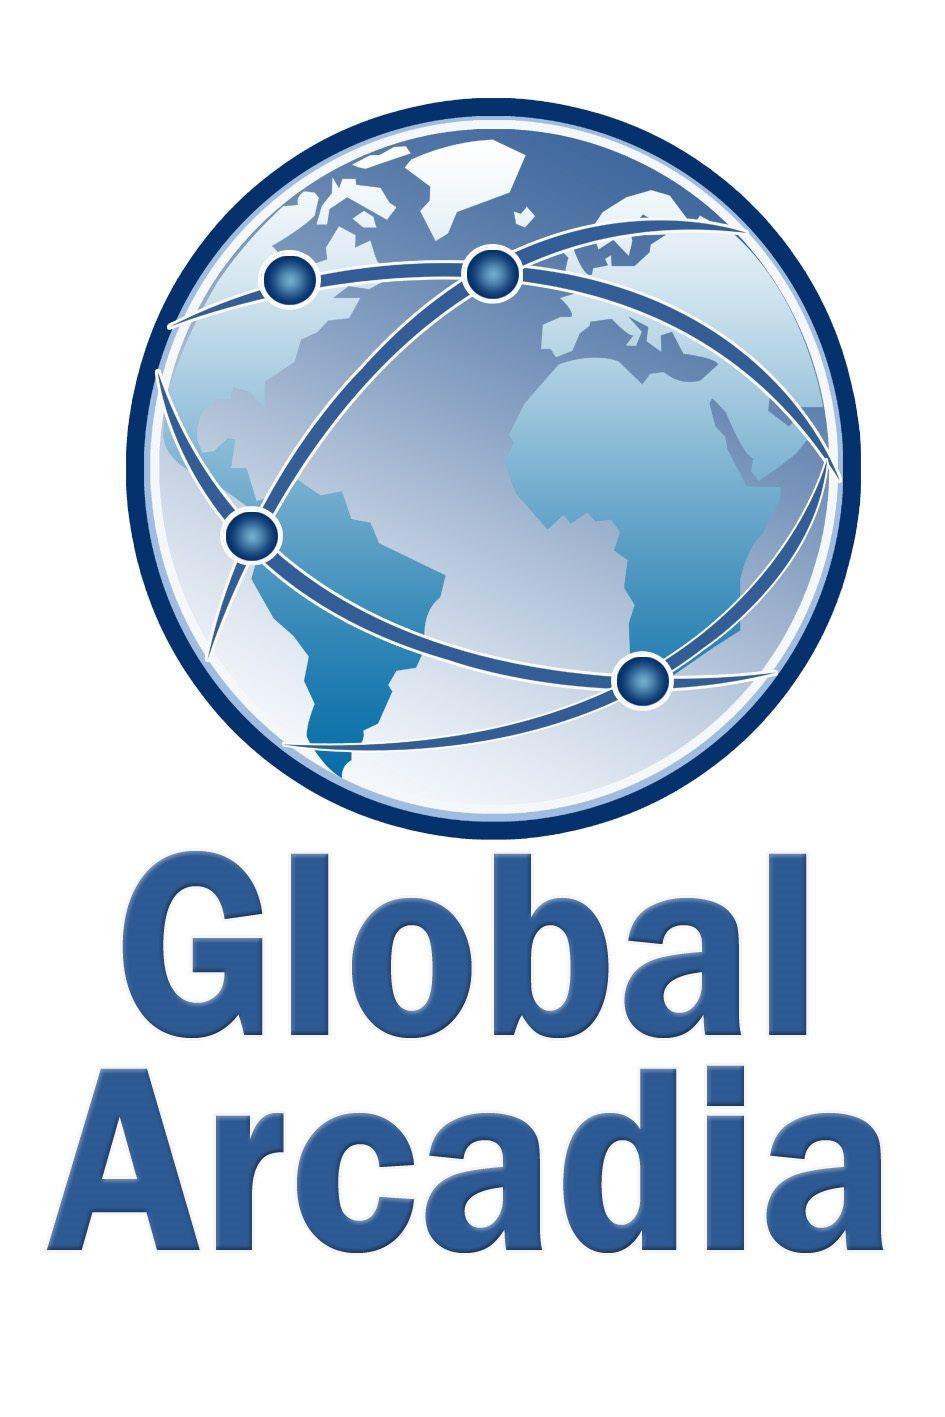 CN Global Arcadia, S.L